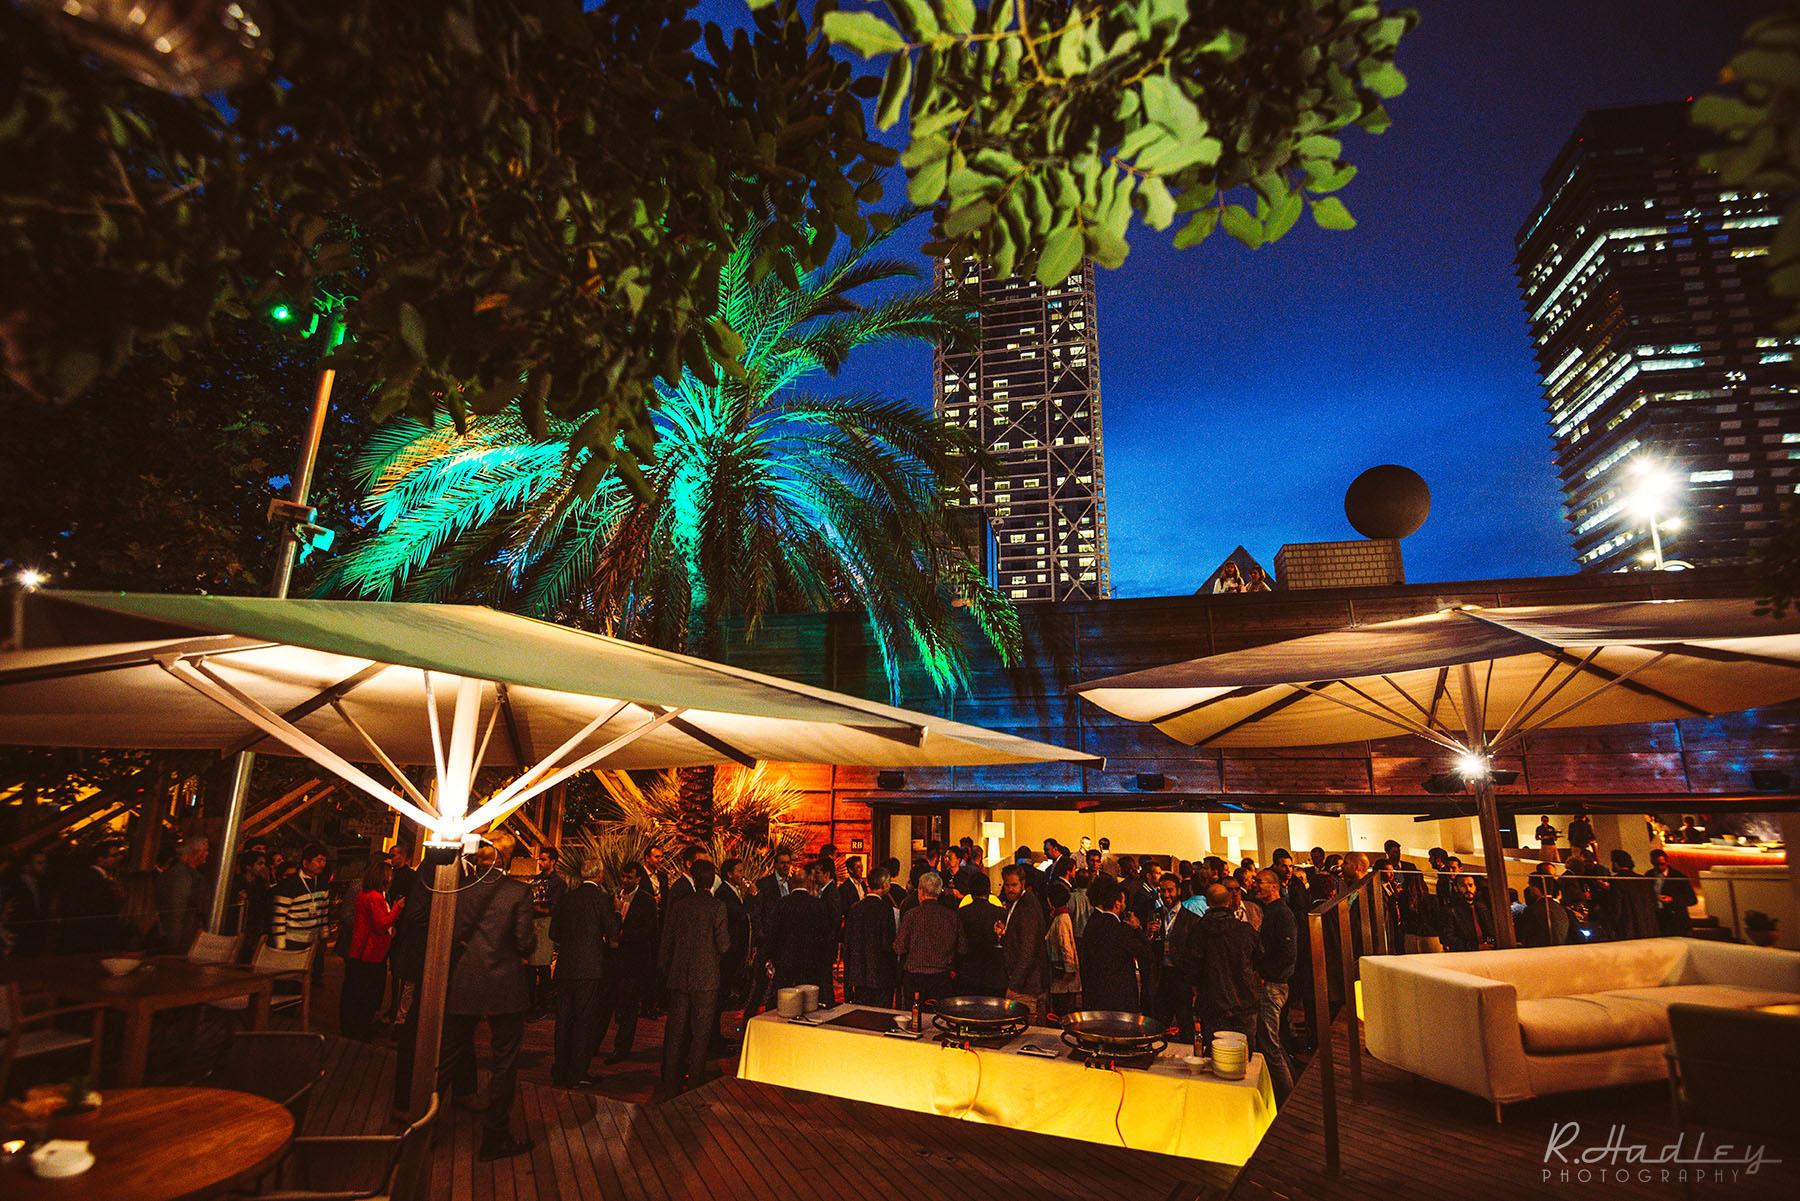 Event melia sky hotel la bestial barcelona richard for Hotel france barcelona